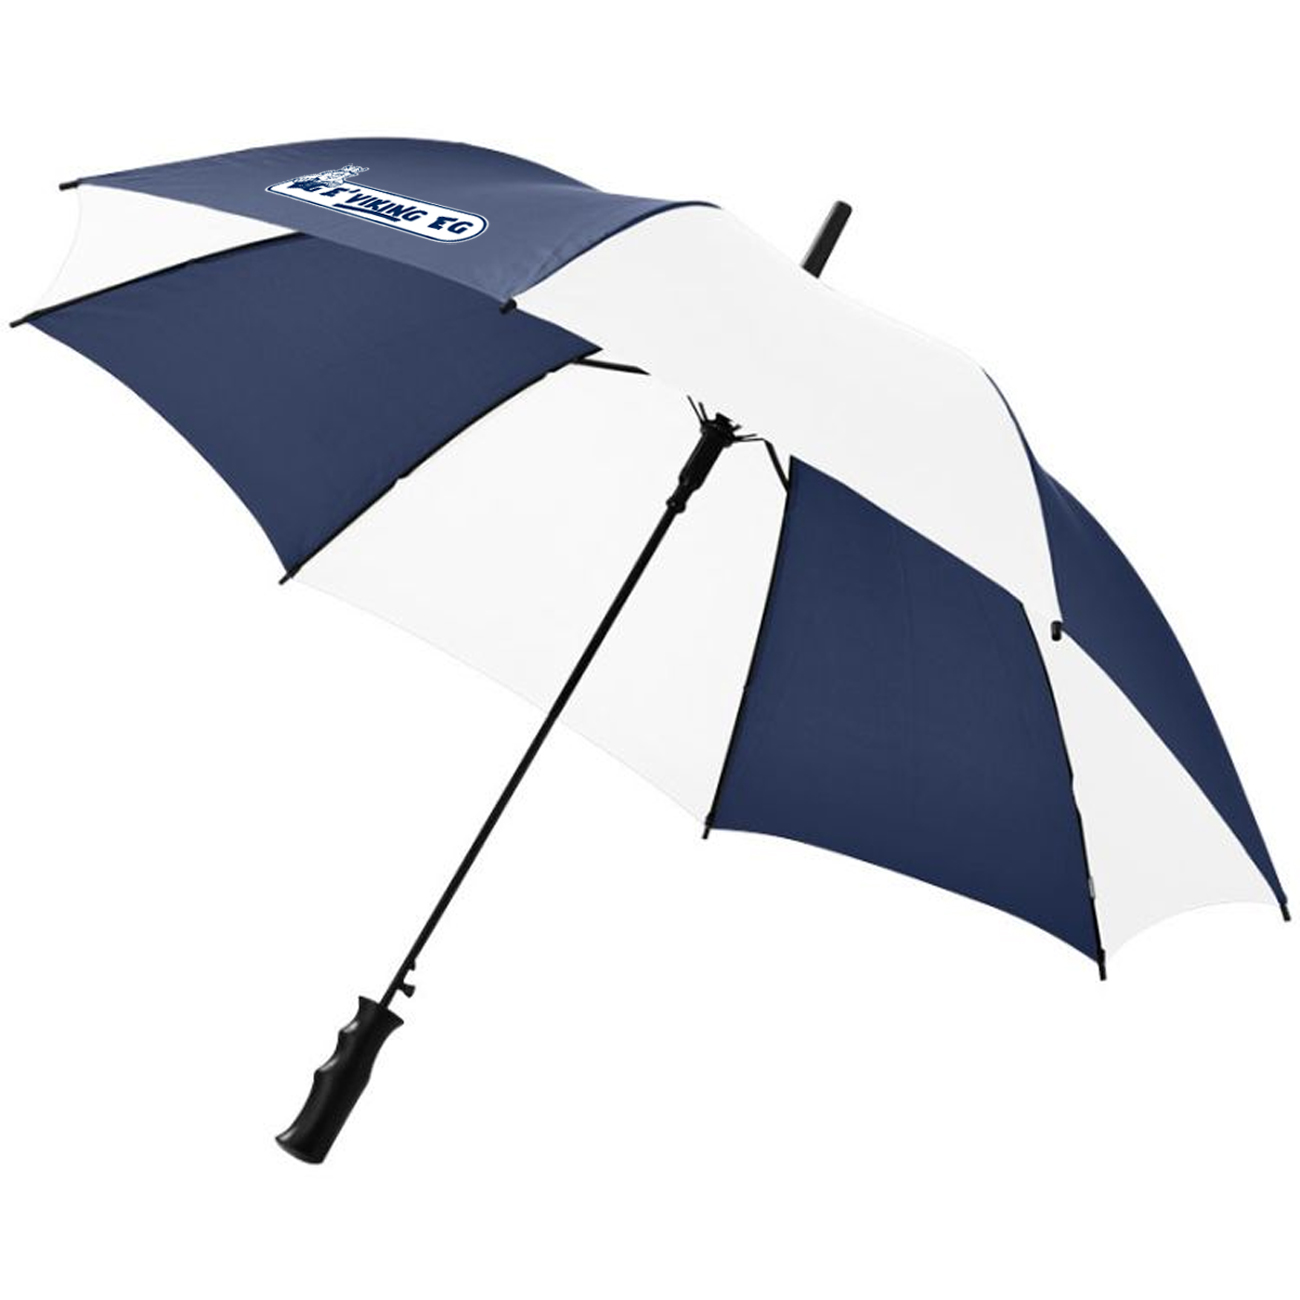 Paraply blå/hvit